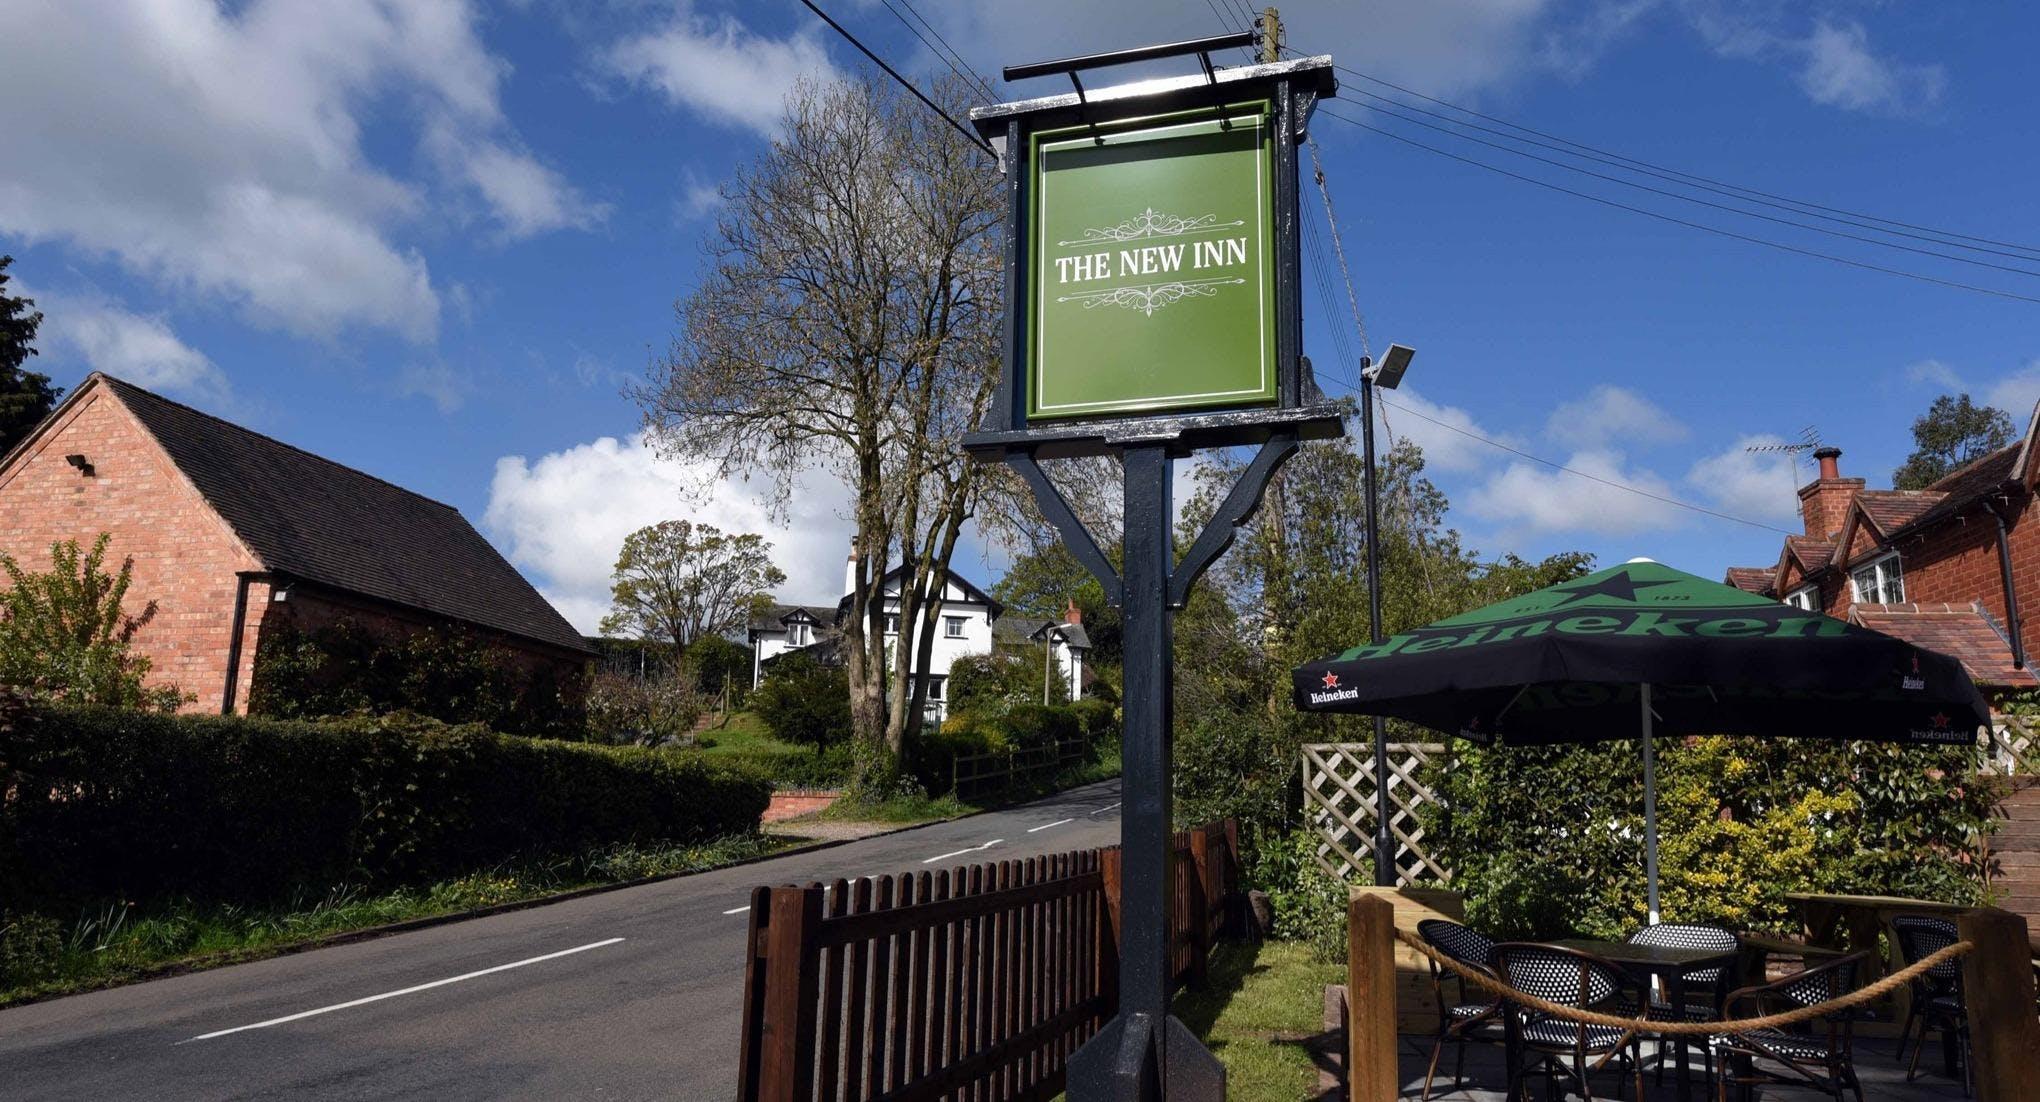 The New Inn - Bournheath Bromsgrove image 1